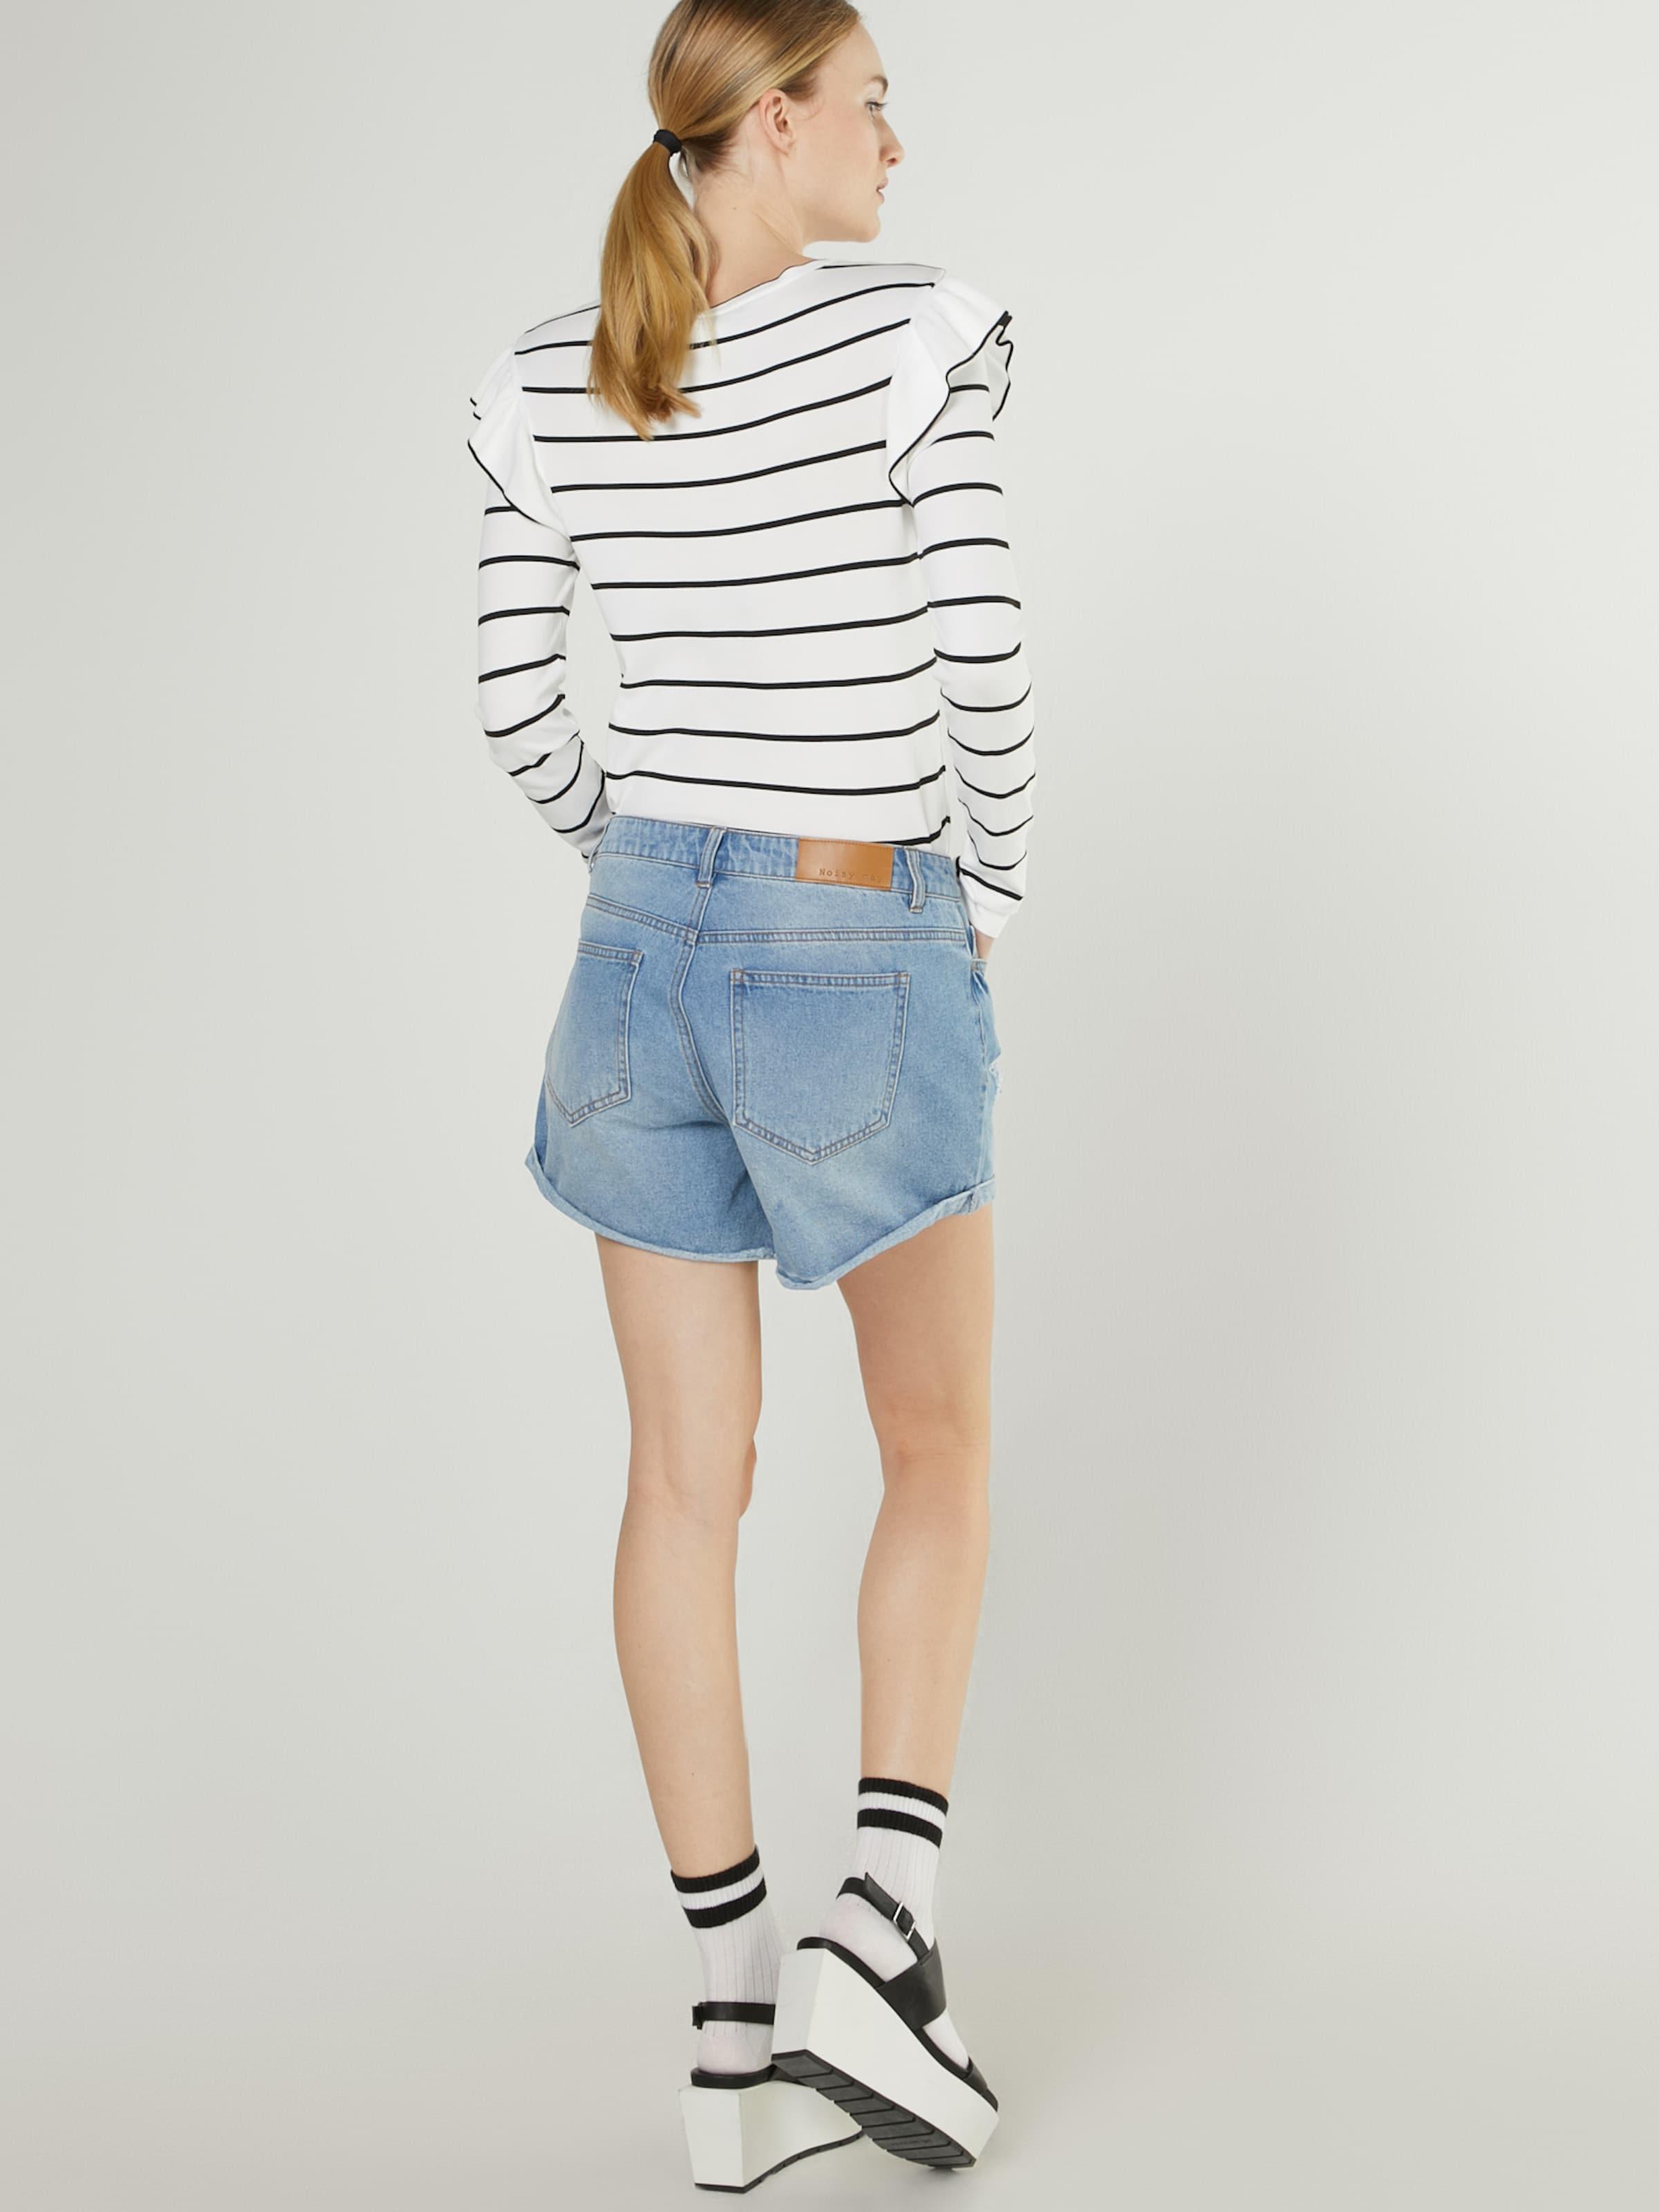 Denim 'immi' Blue May Short Jeans In Noisy SVqMUpz